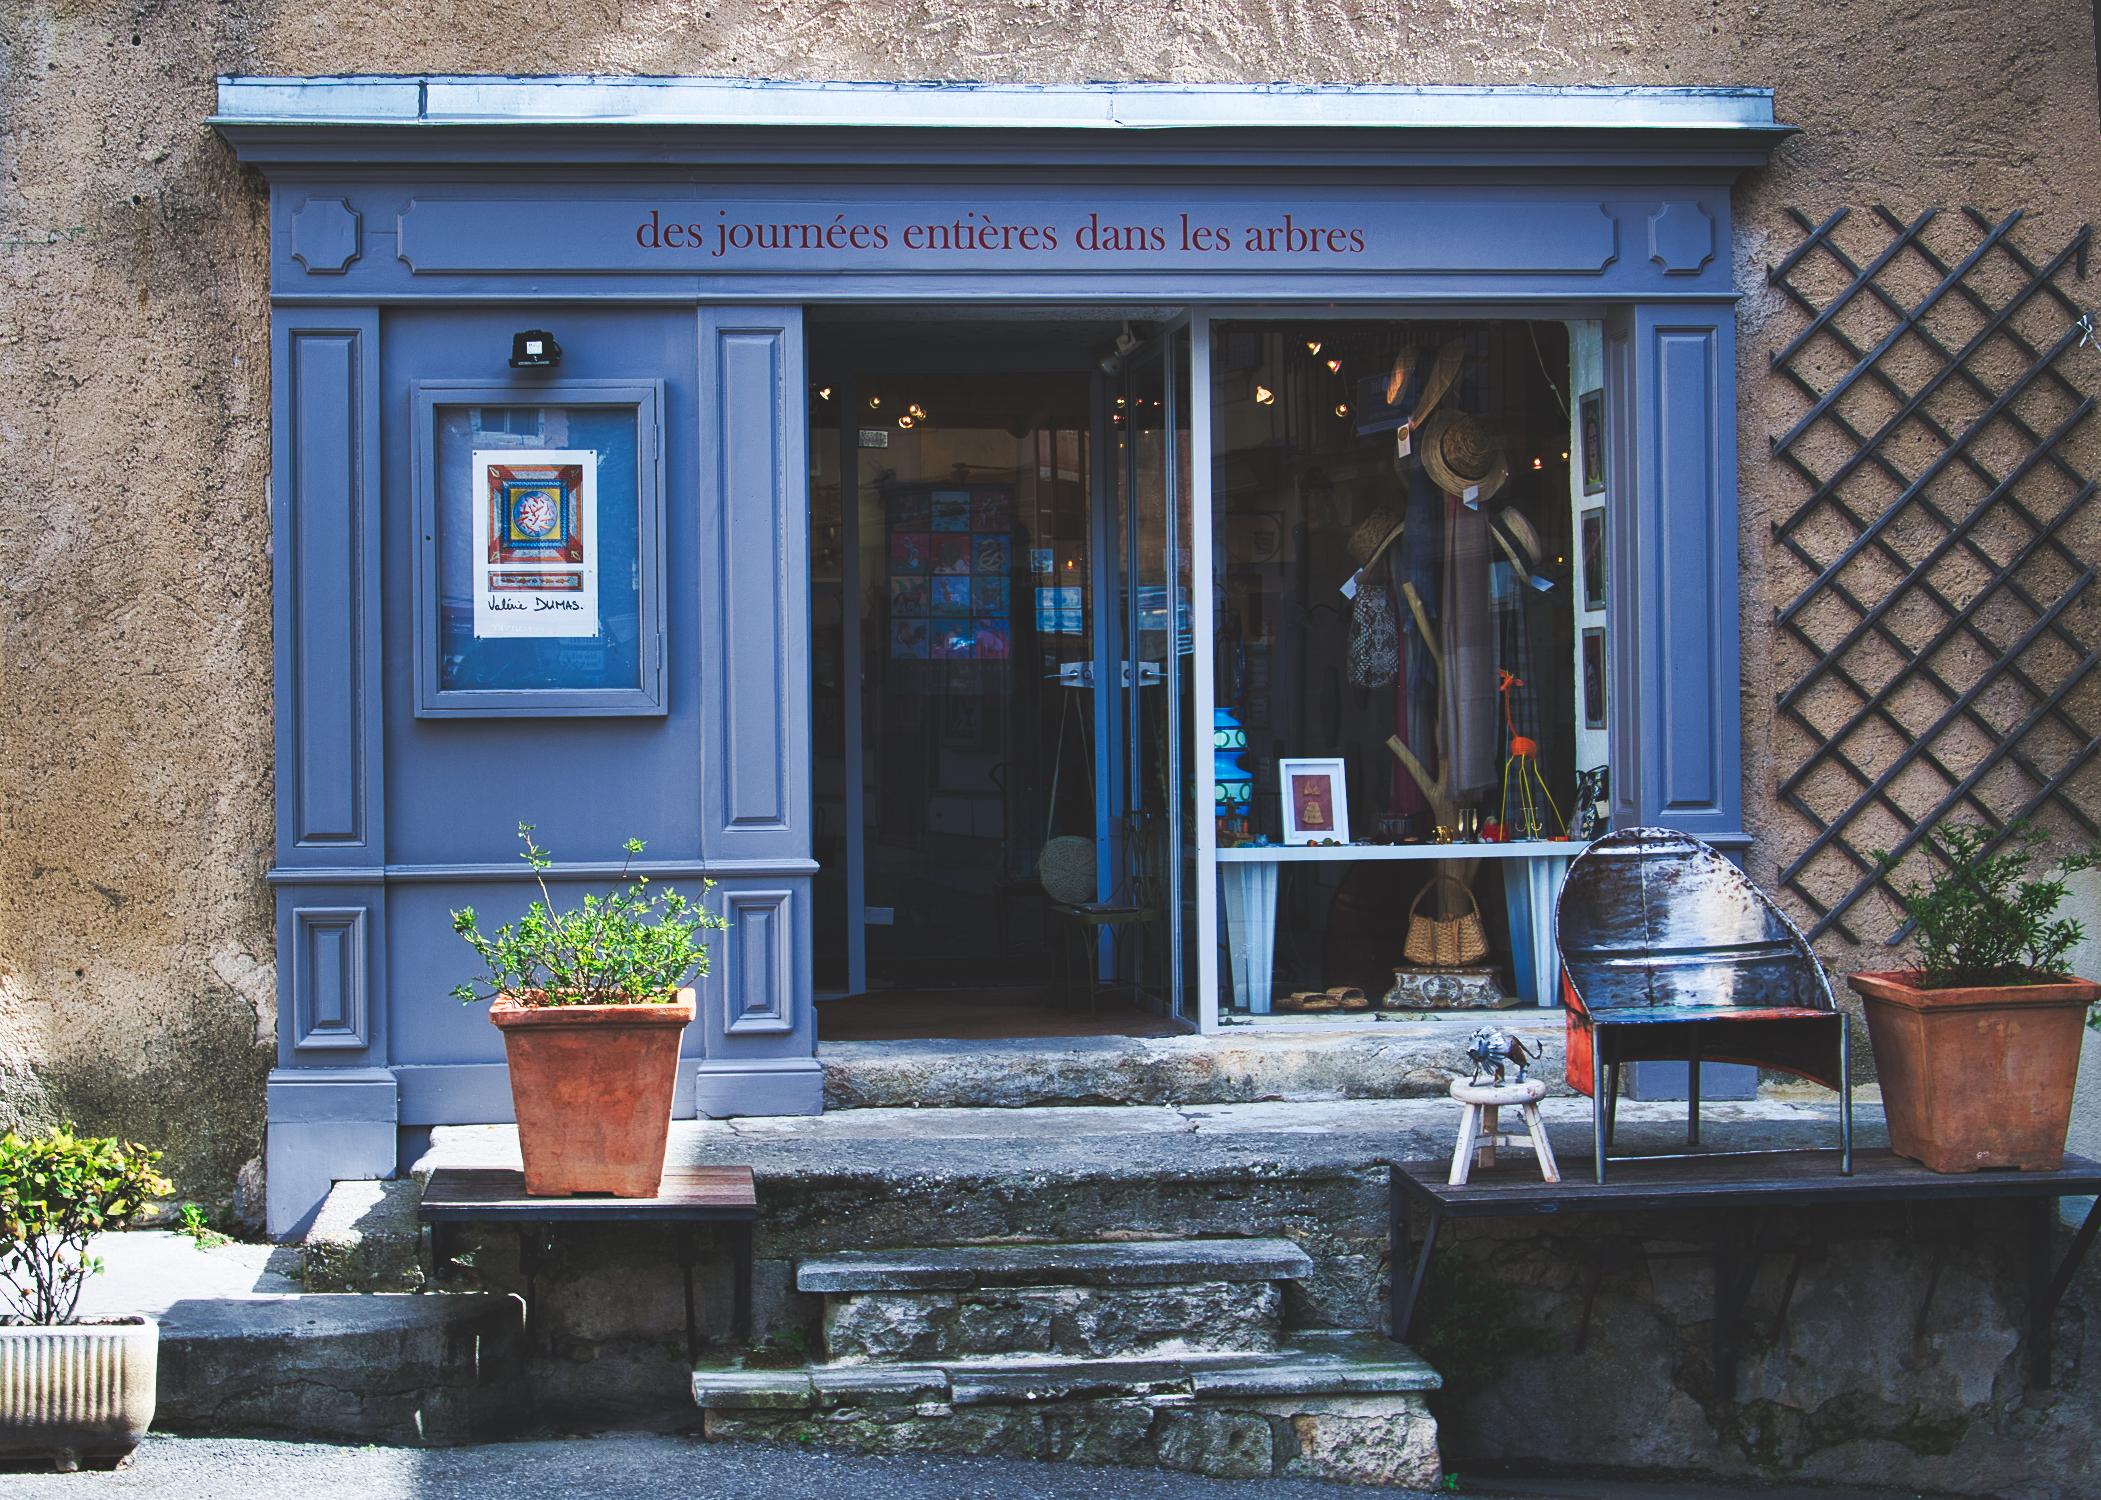 Gordes-Luberon-Provenza-negozio blu_9769.jpeg